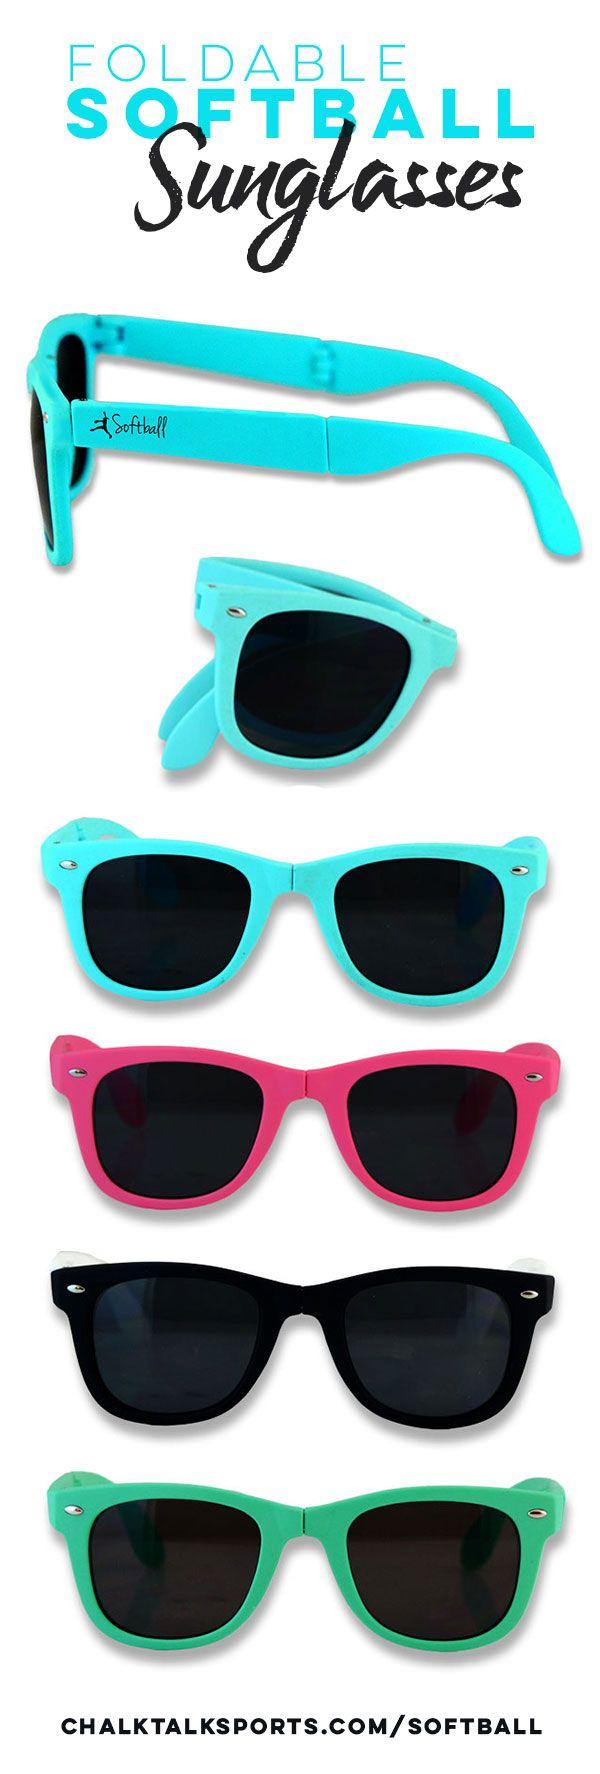 softball sunglasses polarized  17 bedste id茅er til Baseball Sunglasses p氓 Pinterest